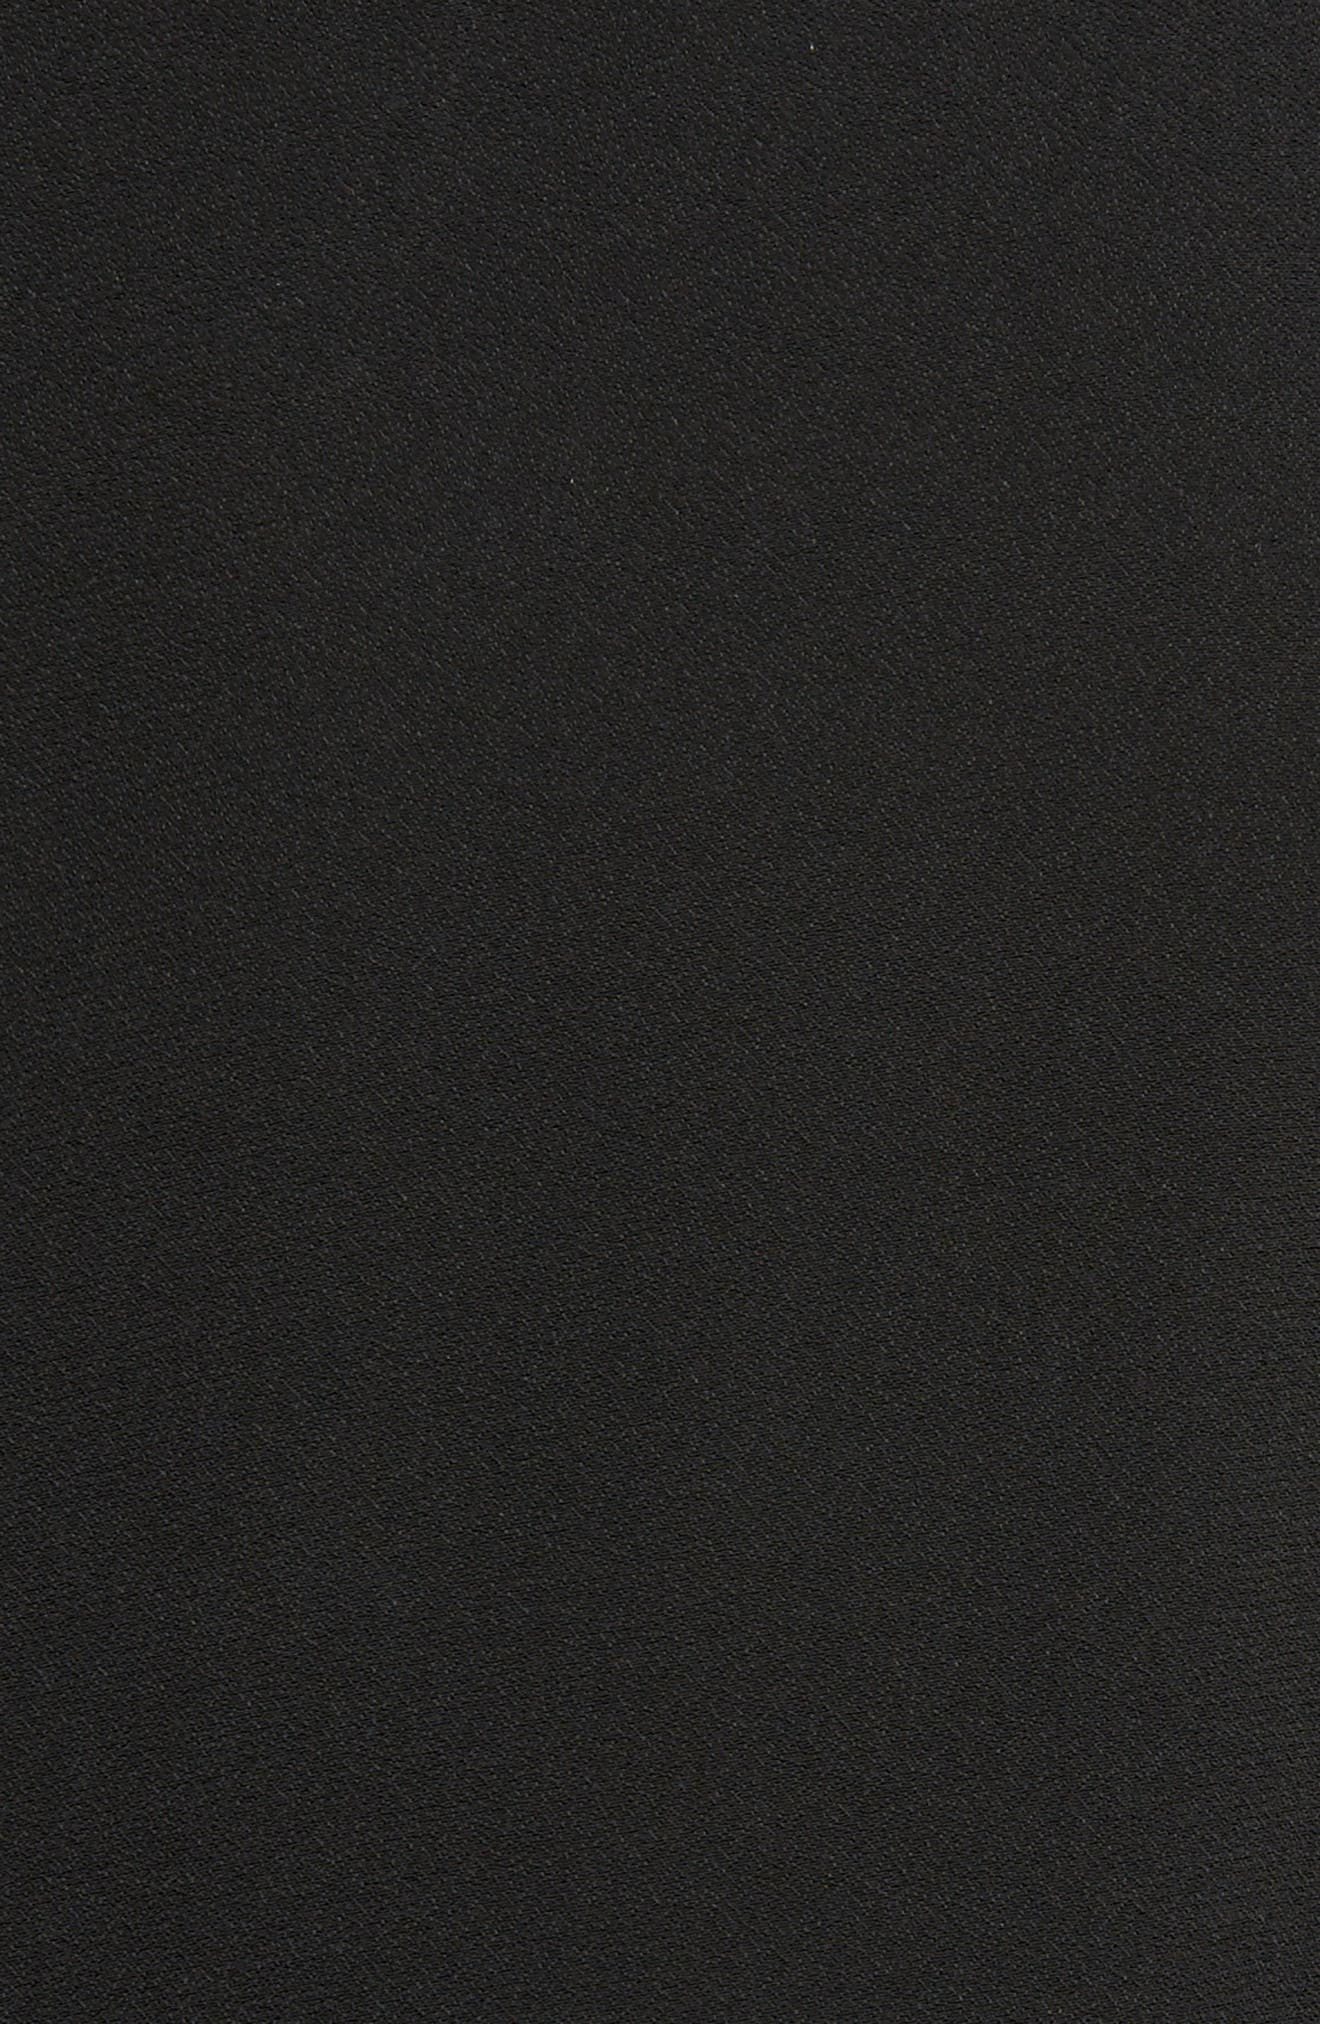 Crystal Embellished Frill Maxi Dress,                             Alternate thumbnail 5, color,                             Black